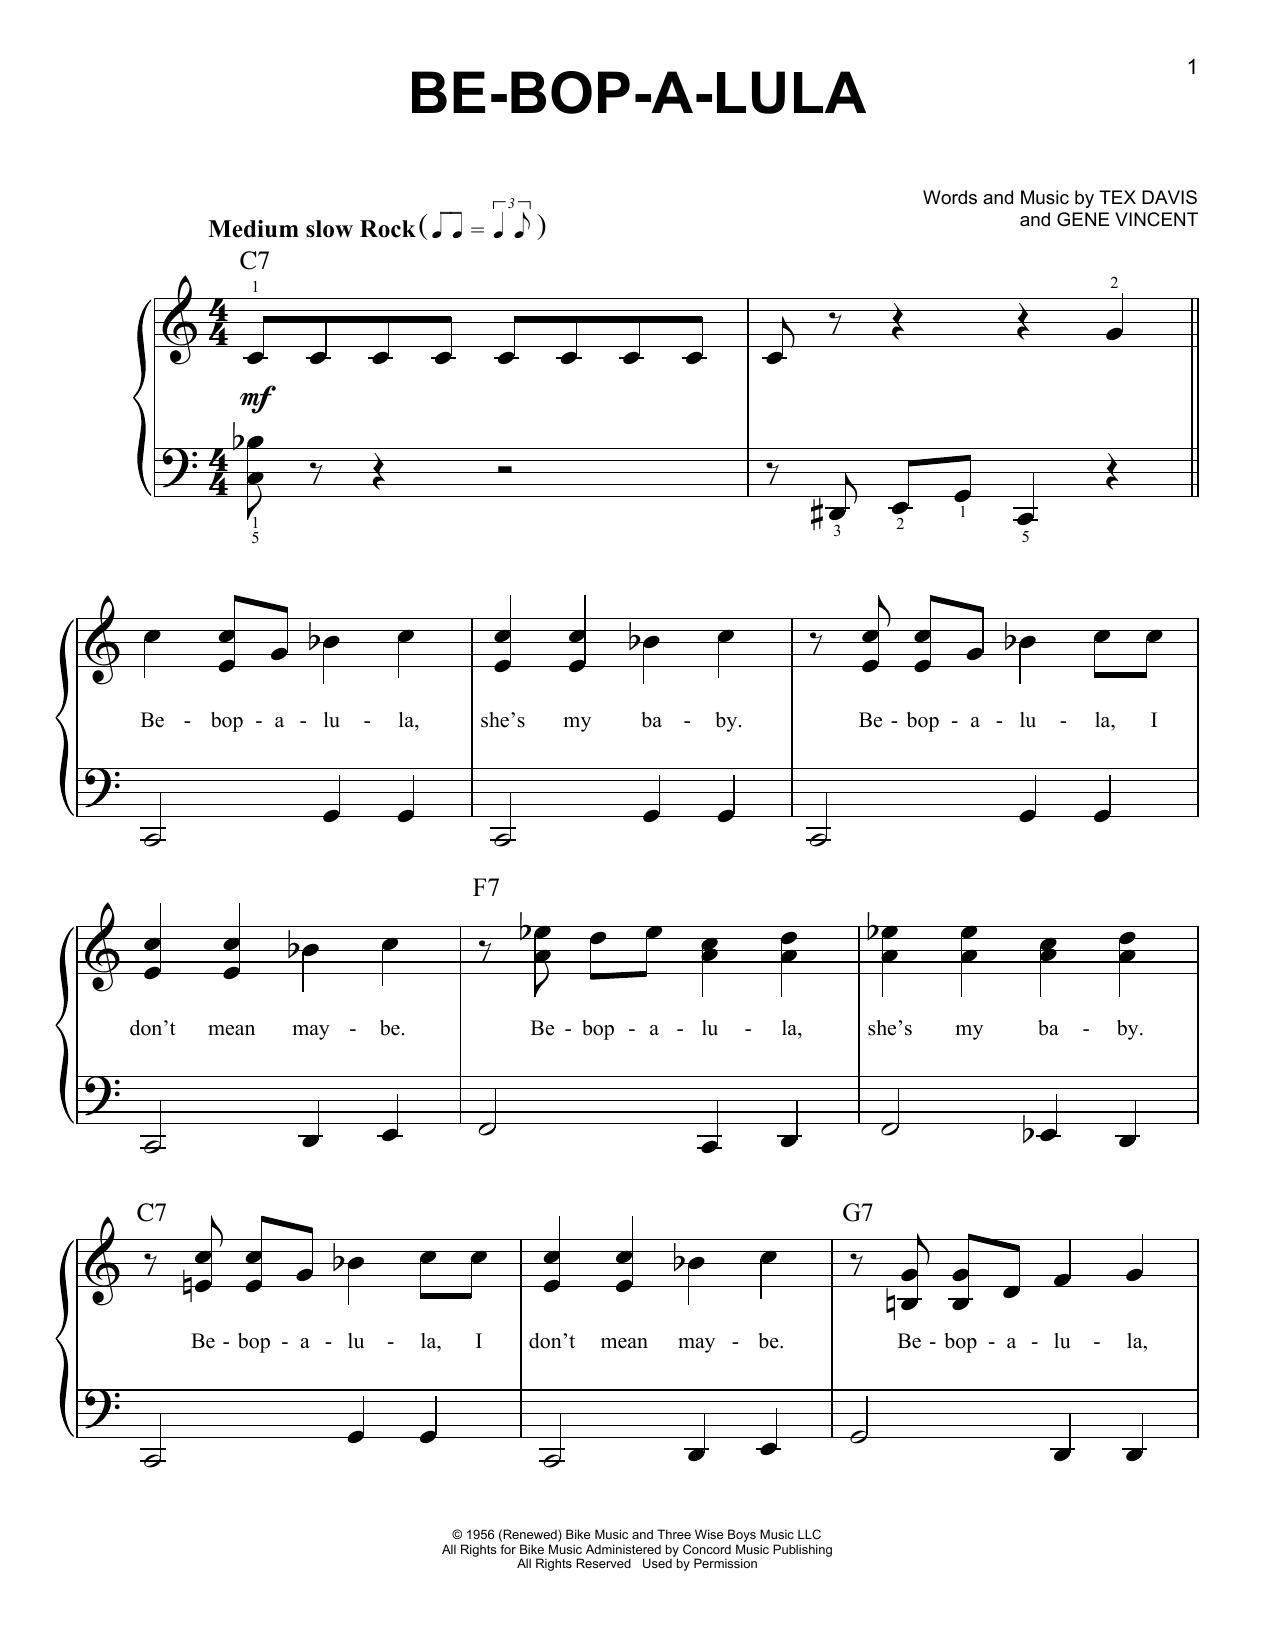 Be-Bop-A-Lula Sheet Music